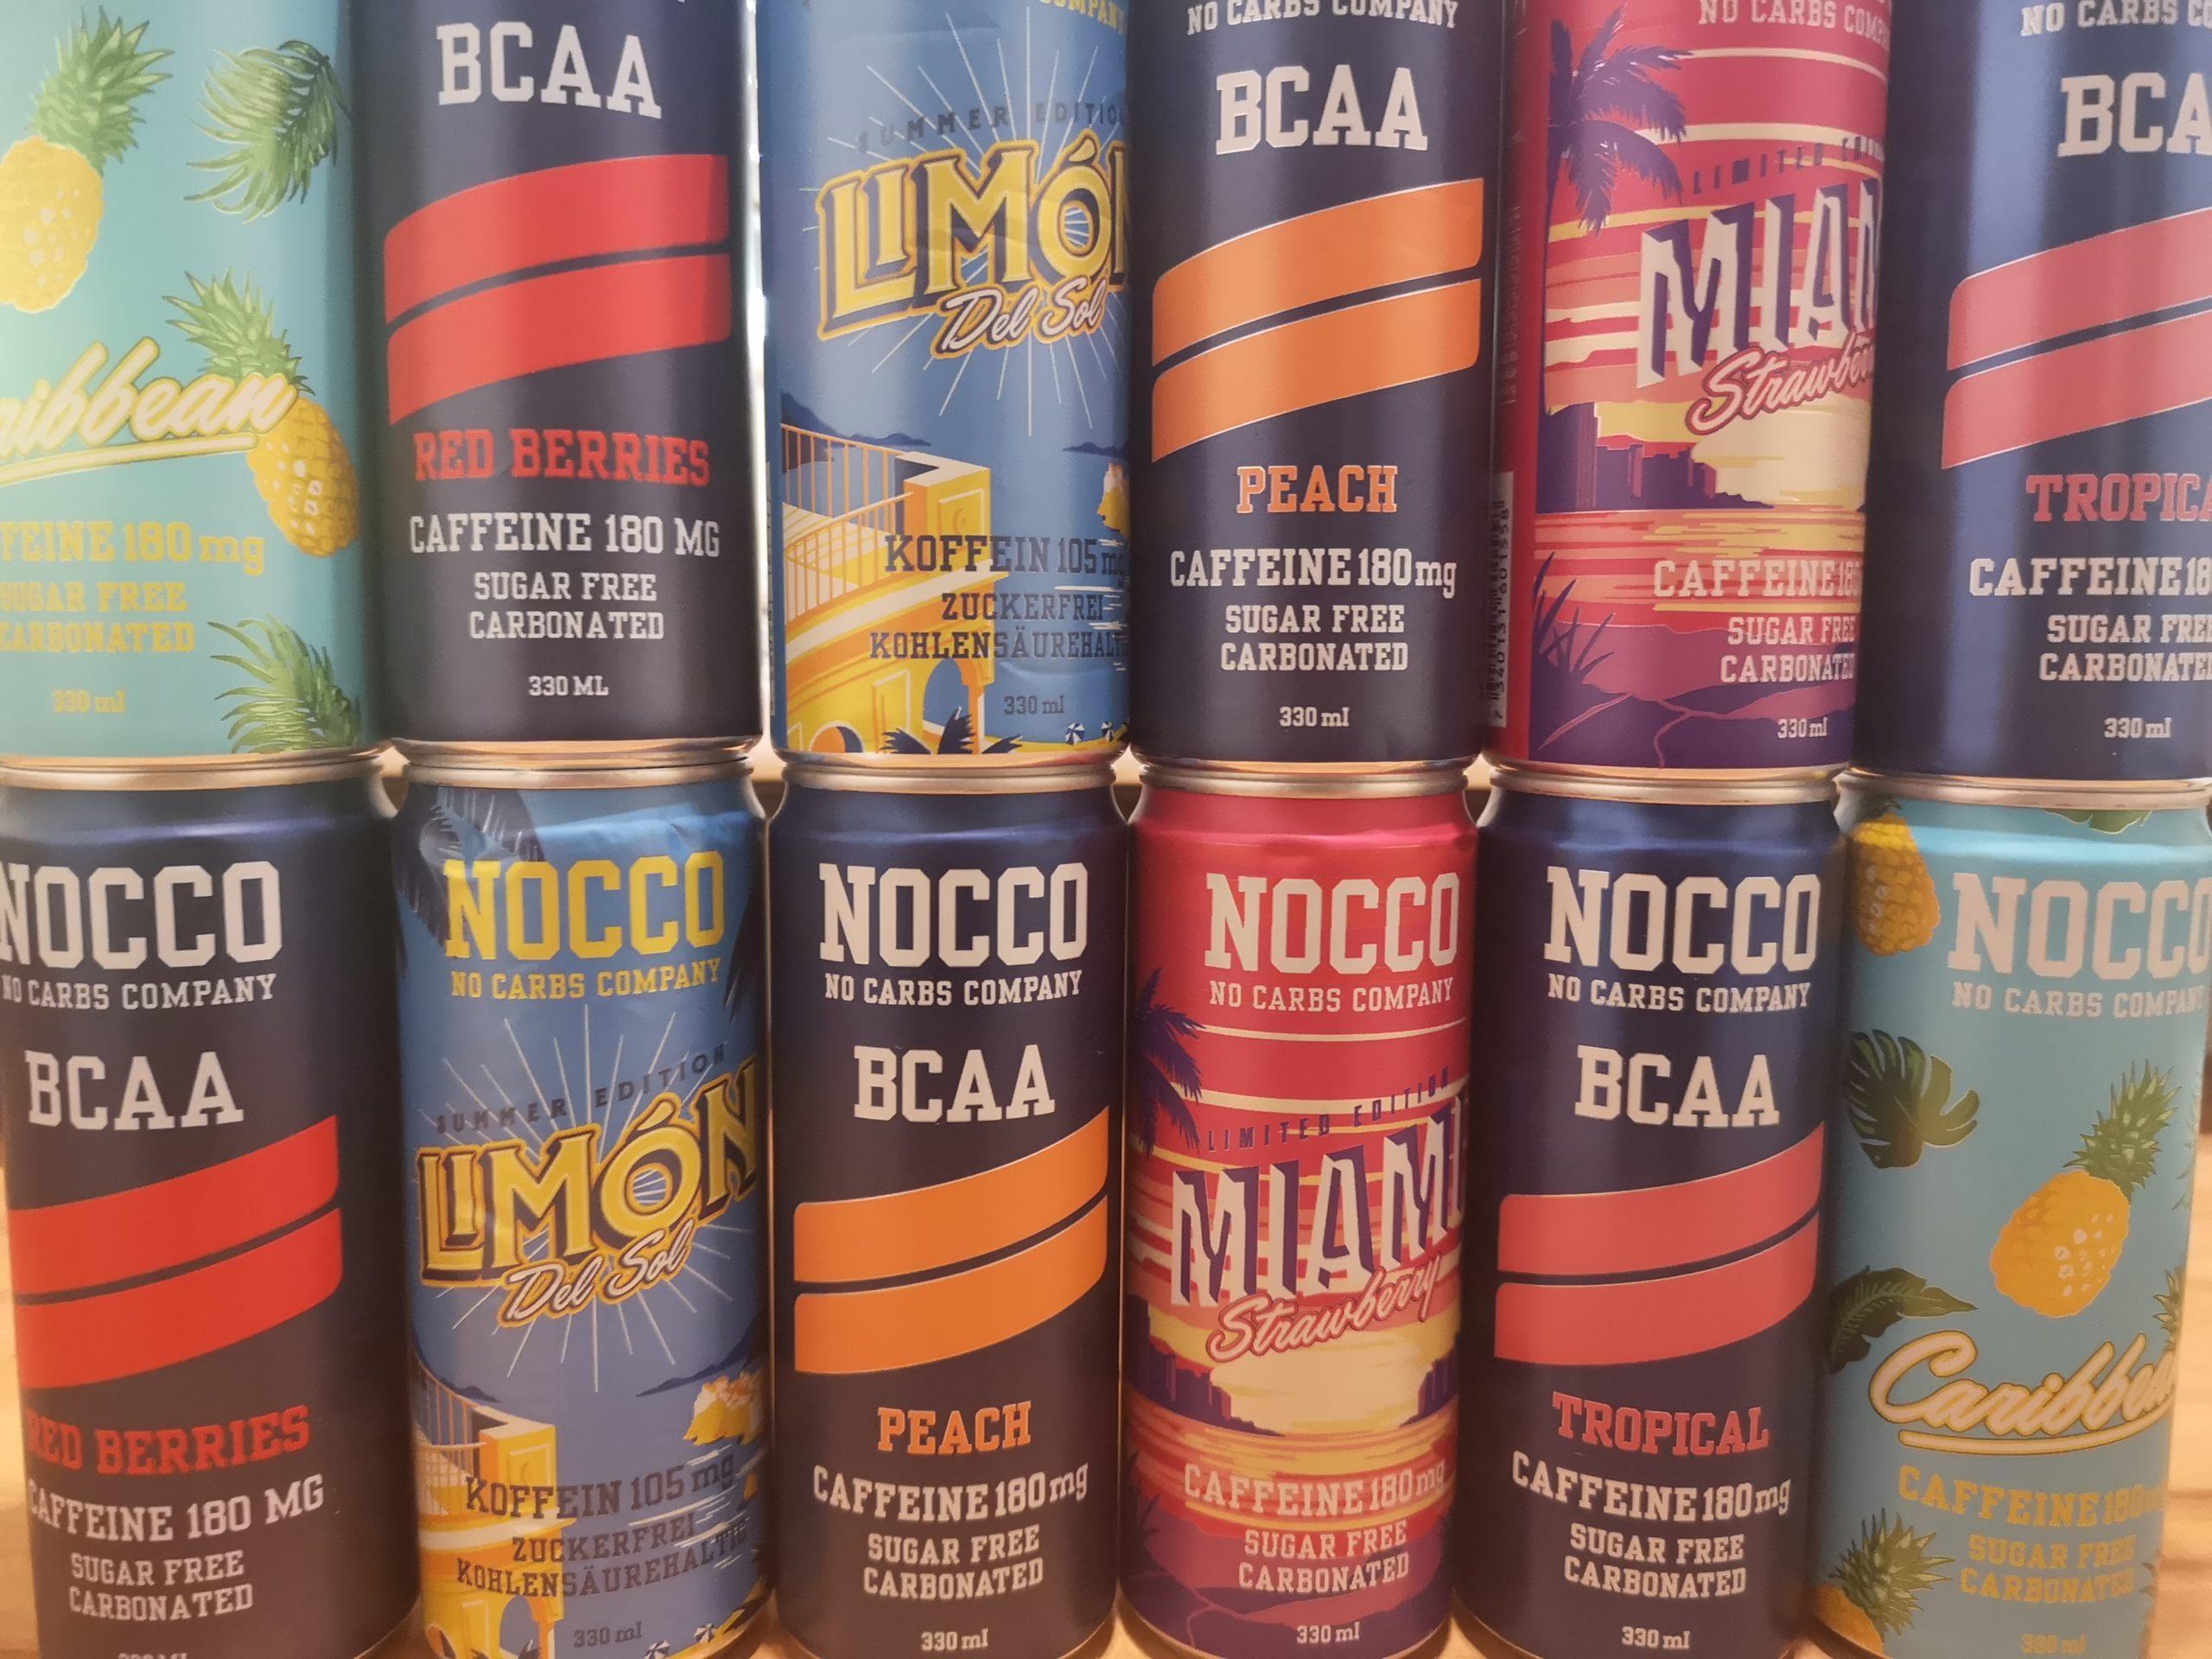 Nocco BCAA Auswahl